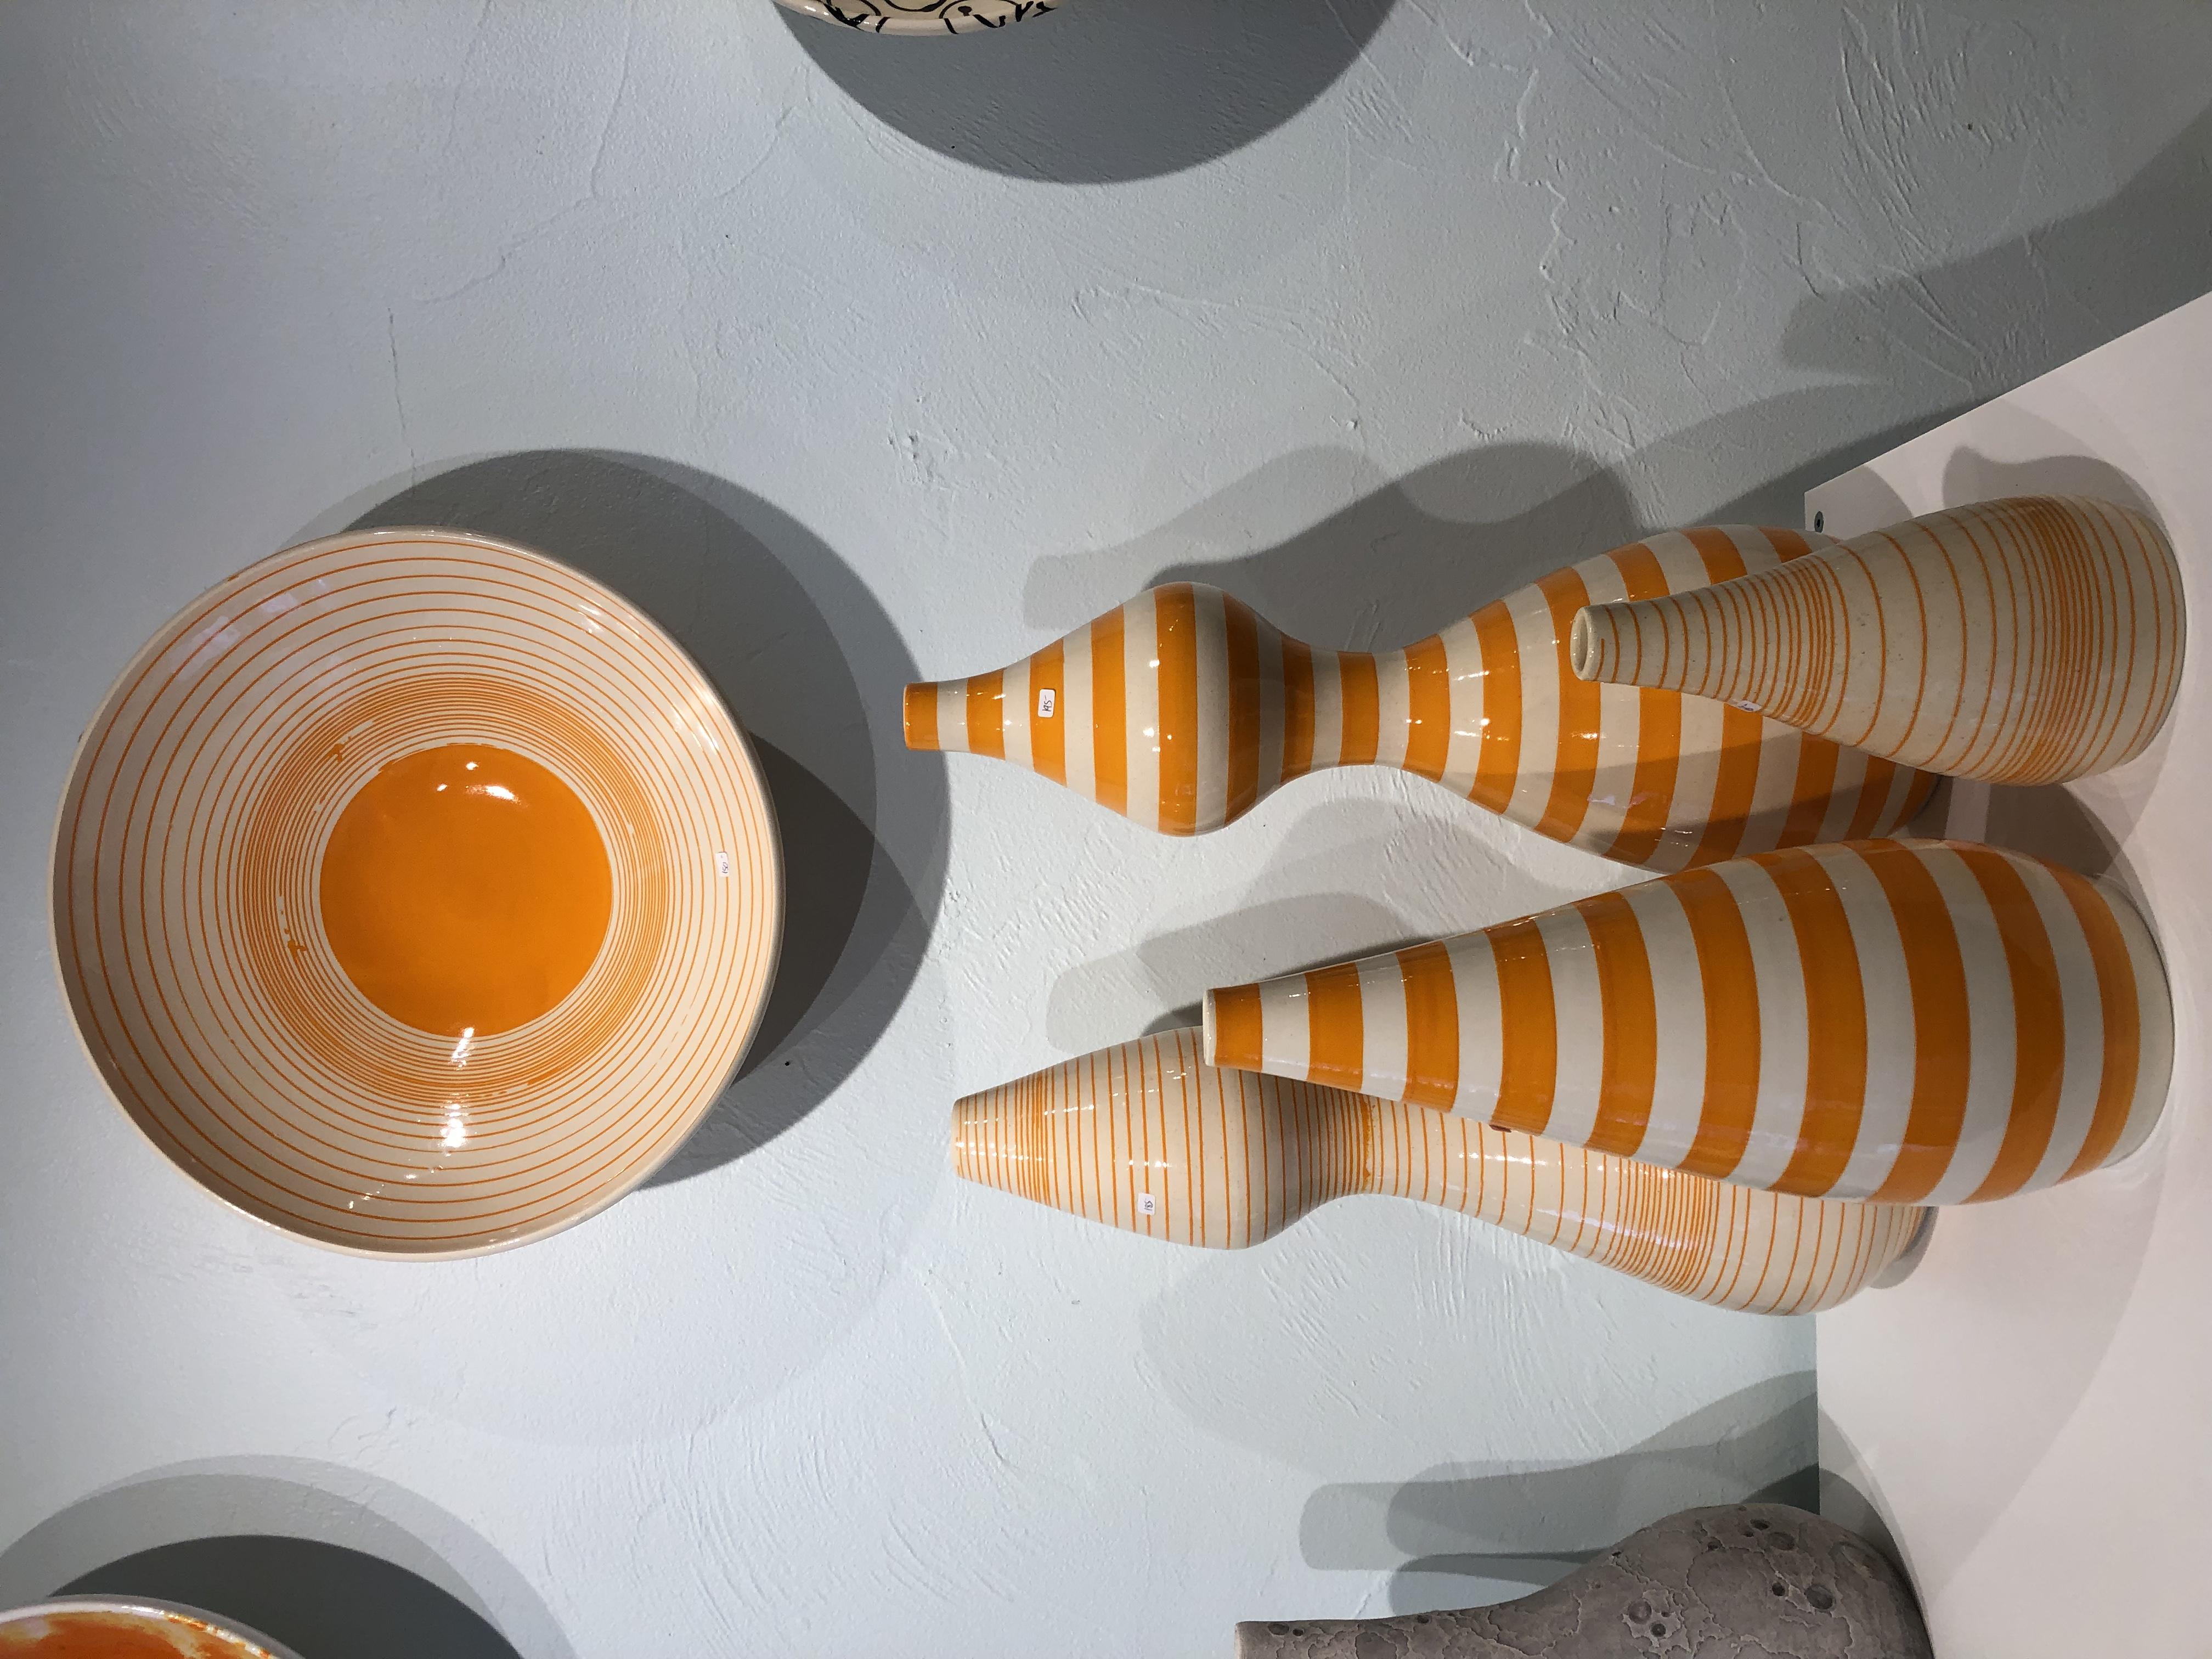 Orange ceramic vessels by Jeff Blandford